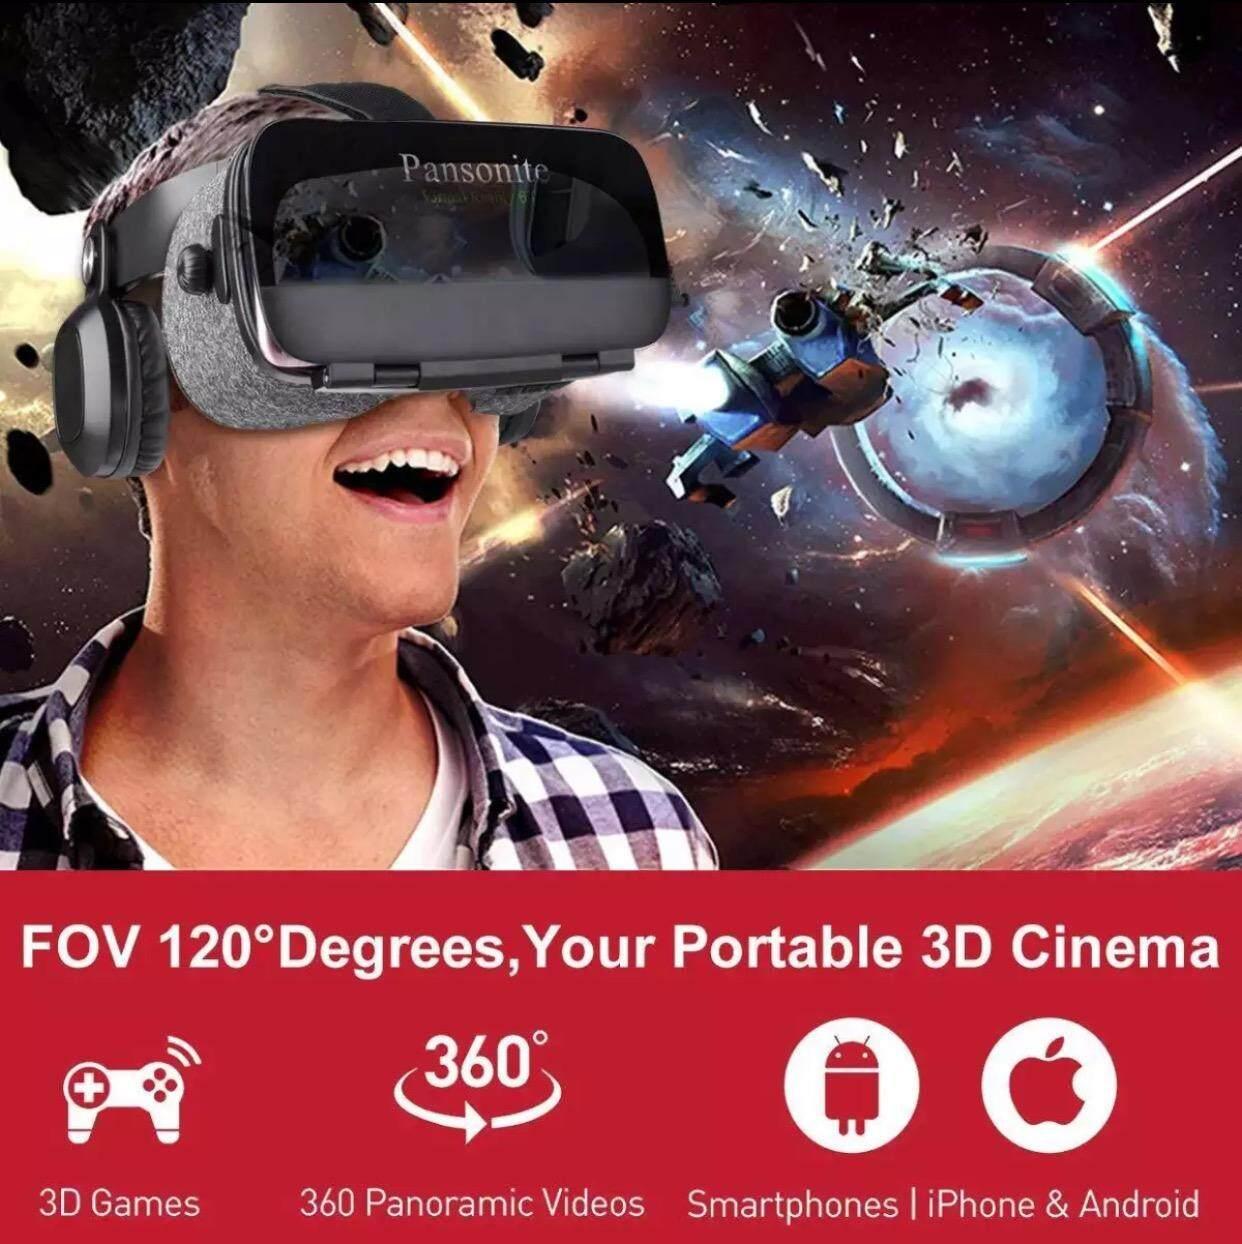 Bobovr Z5 3d Vr แว่นตาเสมือนจริง 120 ° Fov วิดีโอหูฟังเล่นเกมสำหรับ 4.7-6.0 นิ้ว Android และ Ios โทรศัพท์ (ไม่มีบลูทูธ).